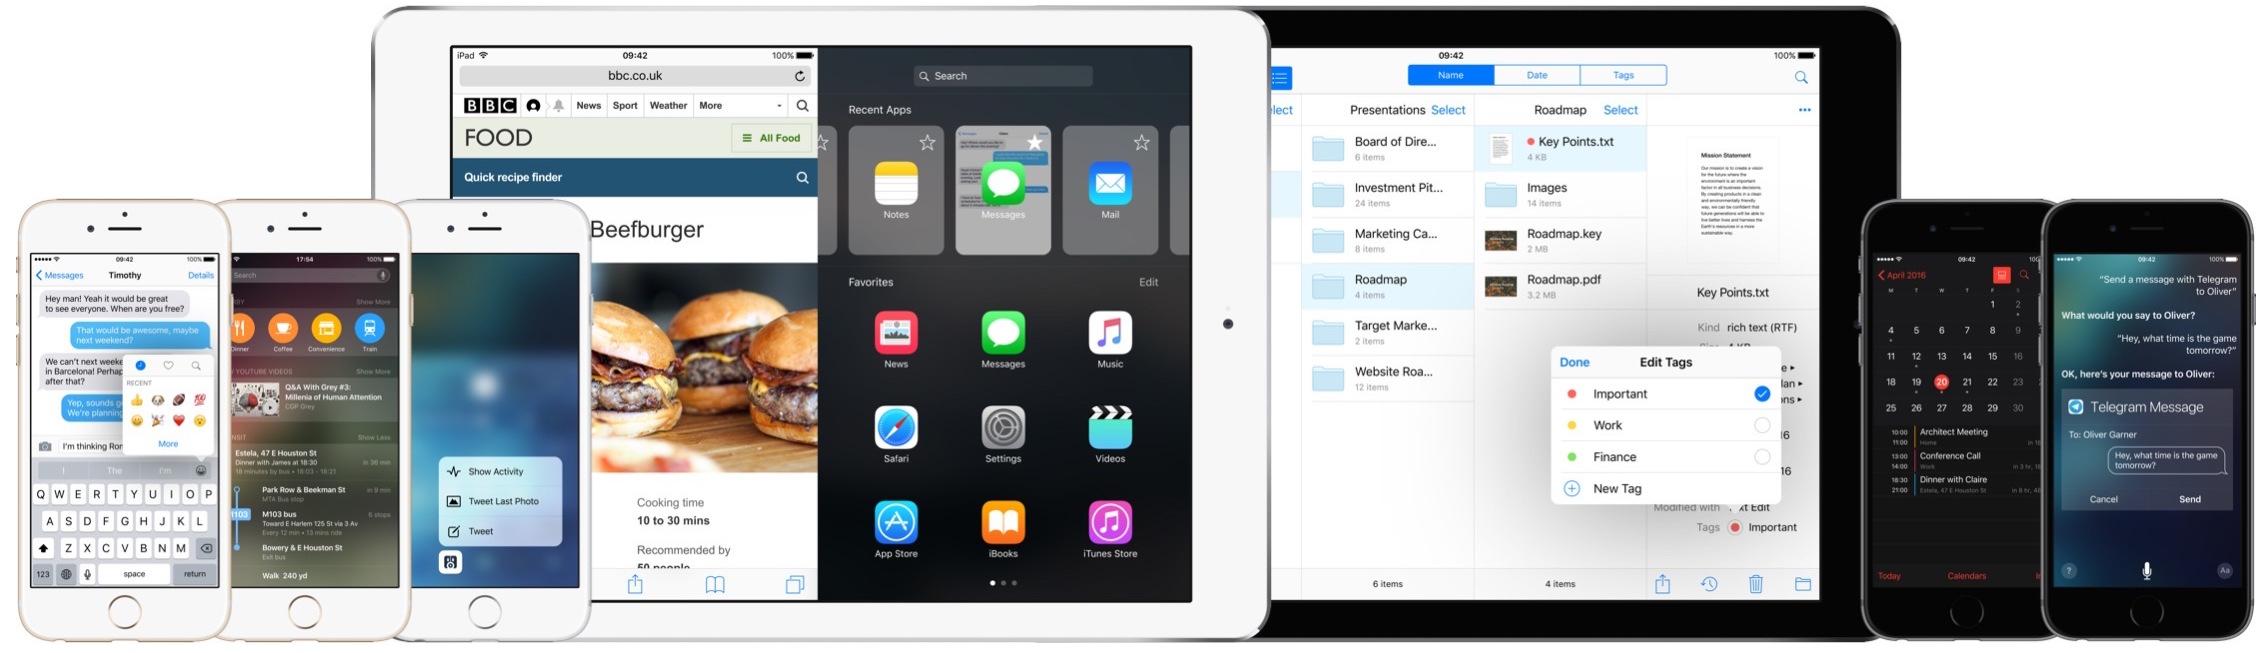 iOS 10 concept MacStories image 001